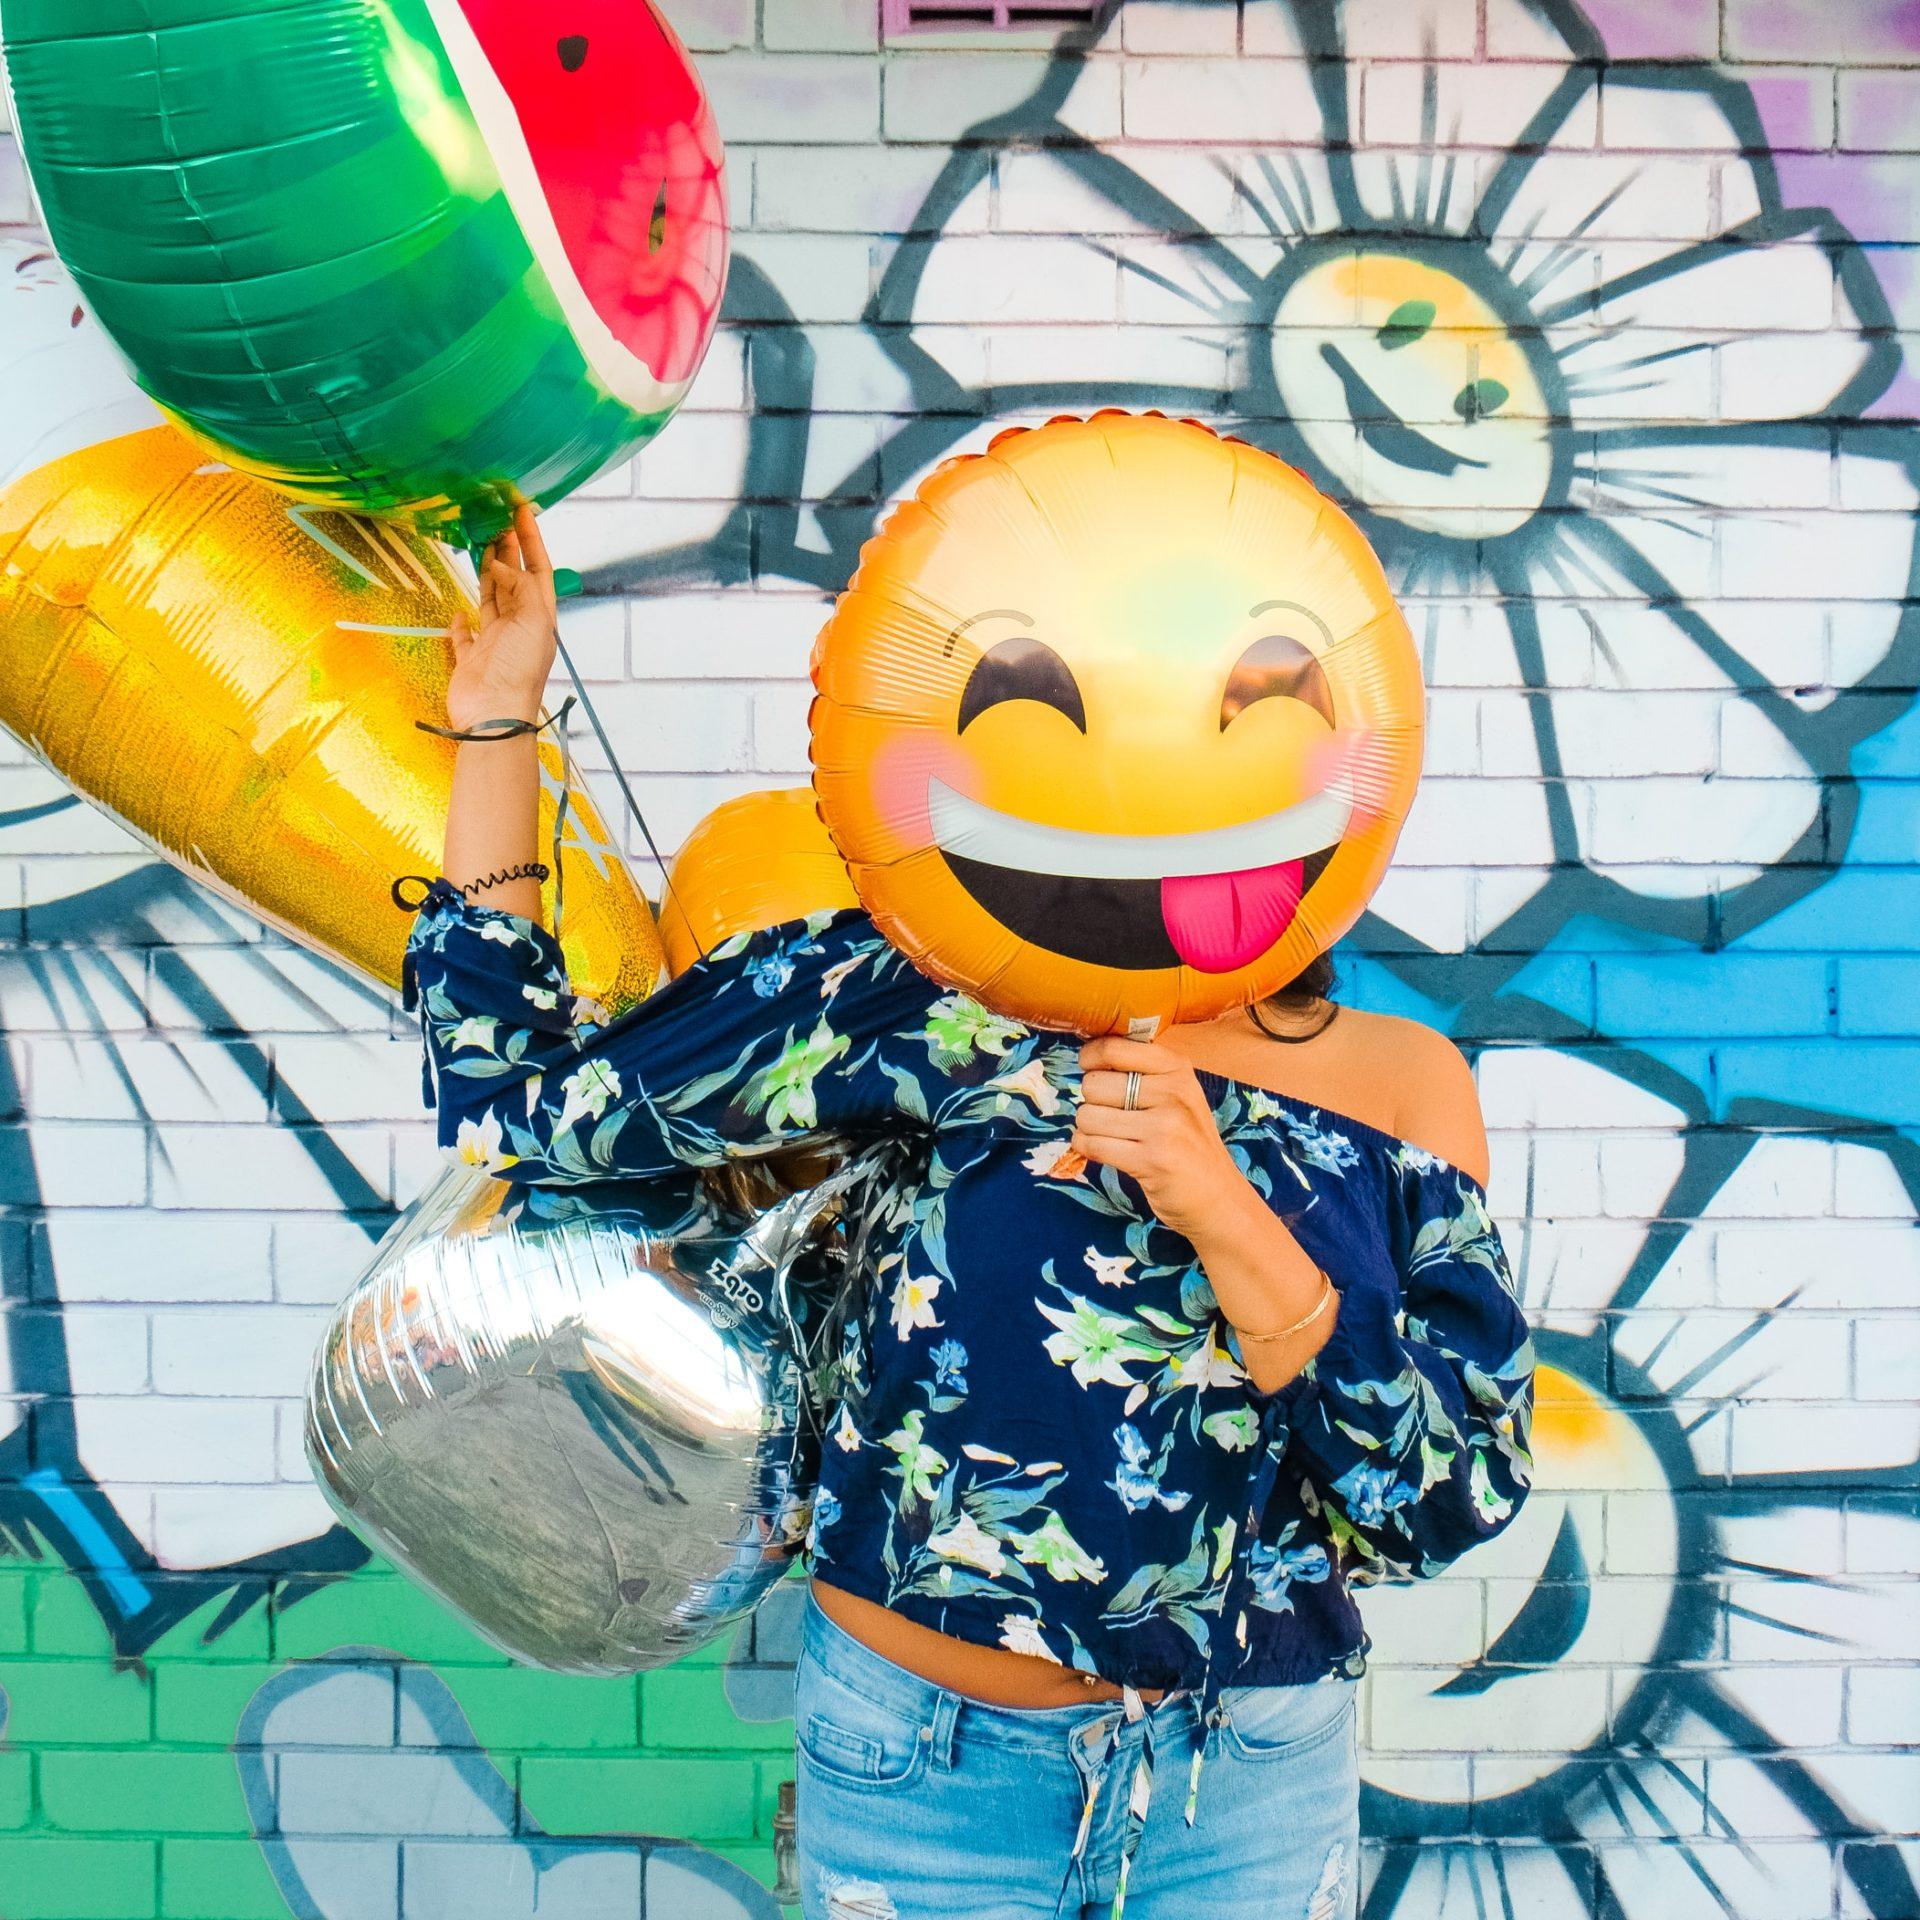 Frau mit Smilyballon Elternblog Isabelle von Abendroth Elternberatung, Elterncoaching, Elternworkshops